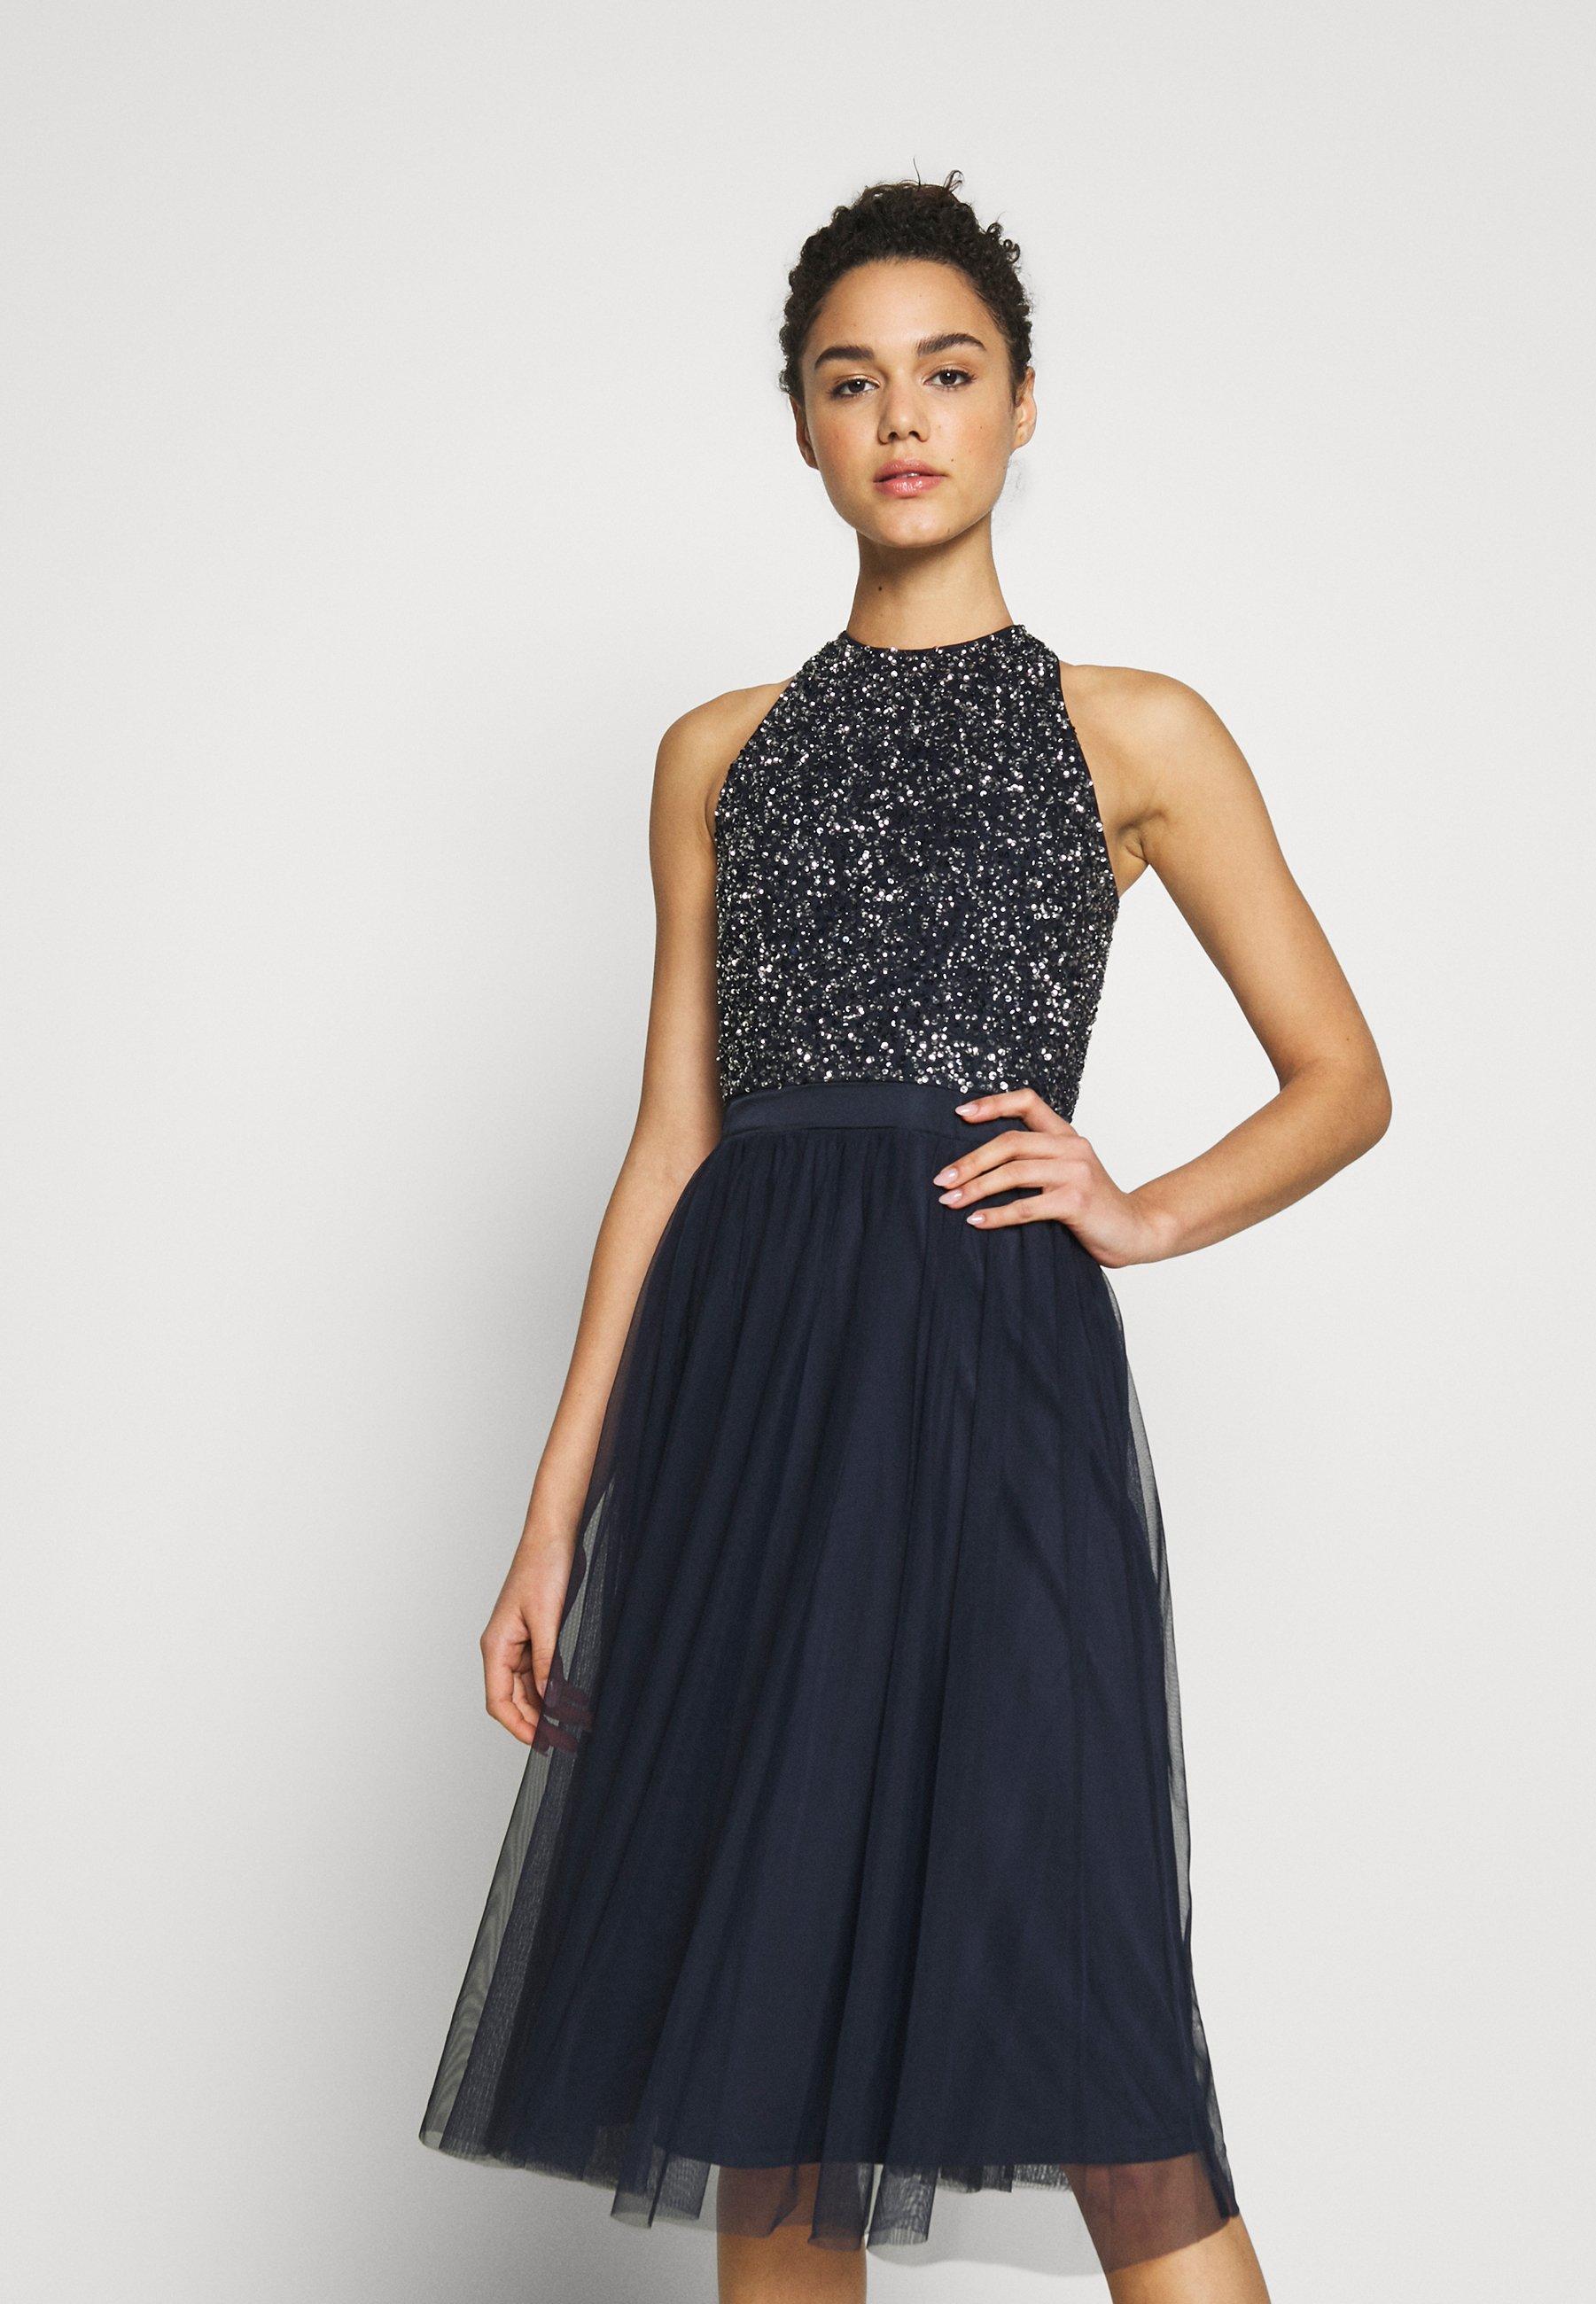 Lace Beads Sania Dress Cocktailkleid Festliches Kleid Navy Dunkelblau Zalando De